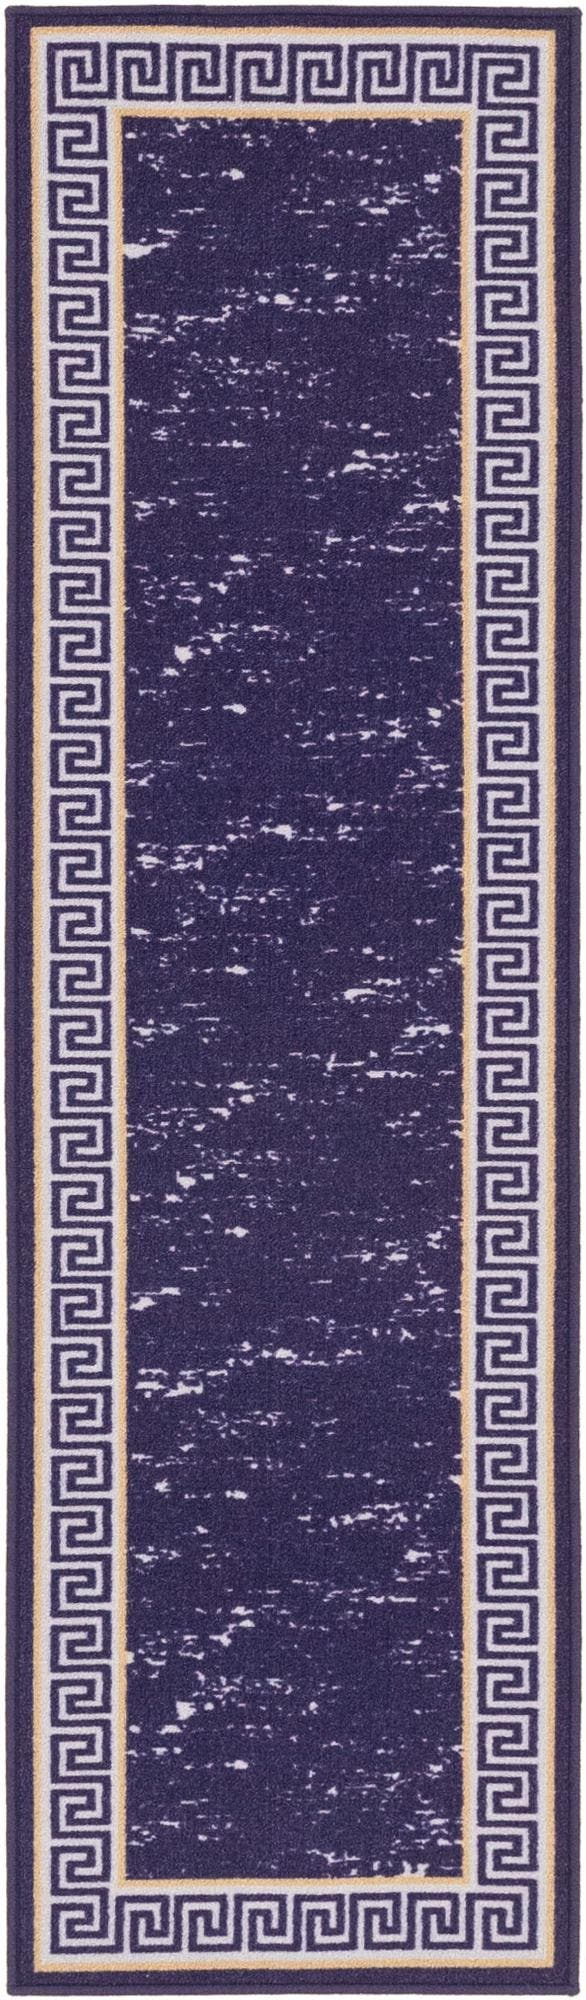 1' 10 x 6' 10 Greek Key Runner Rug main image